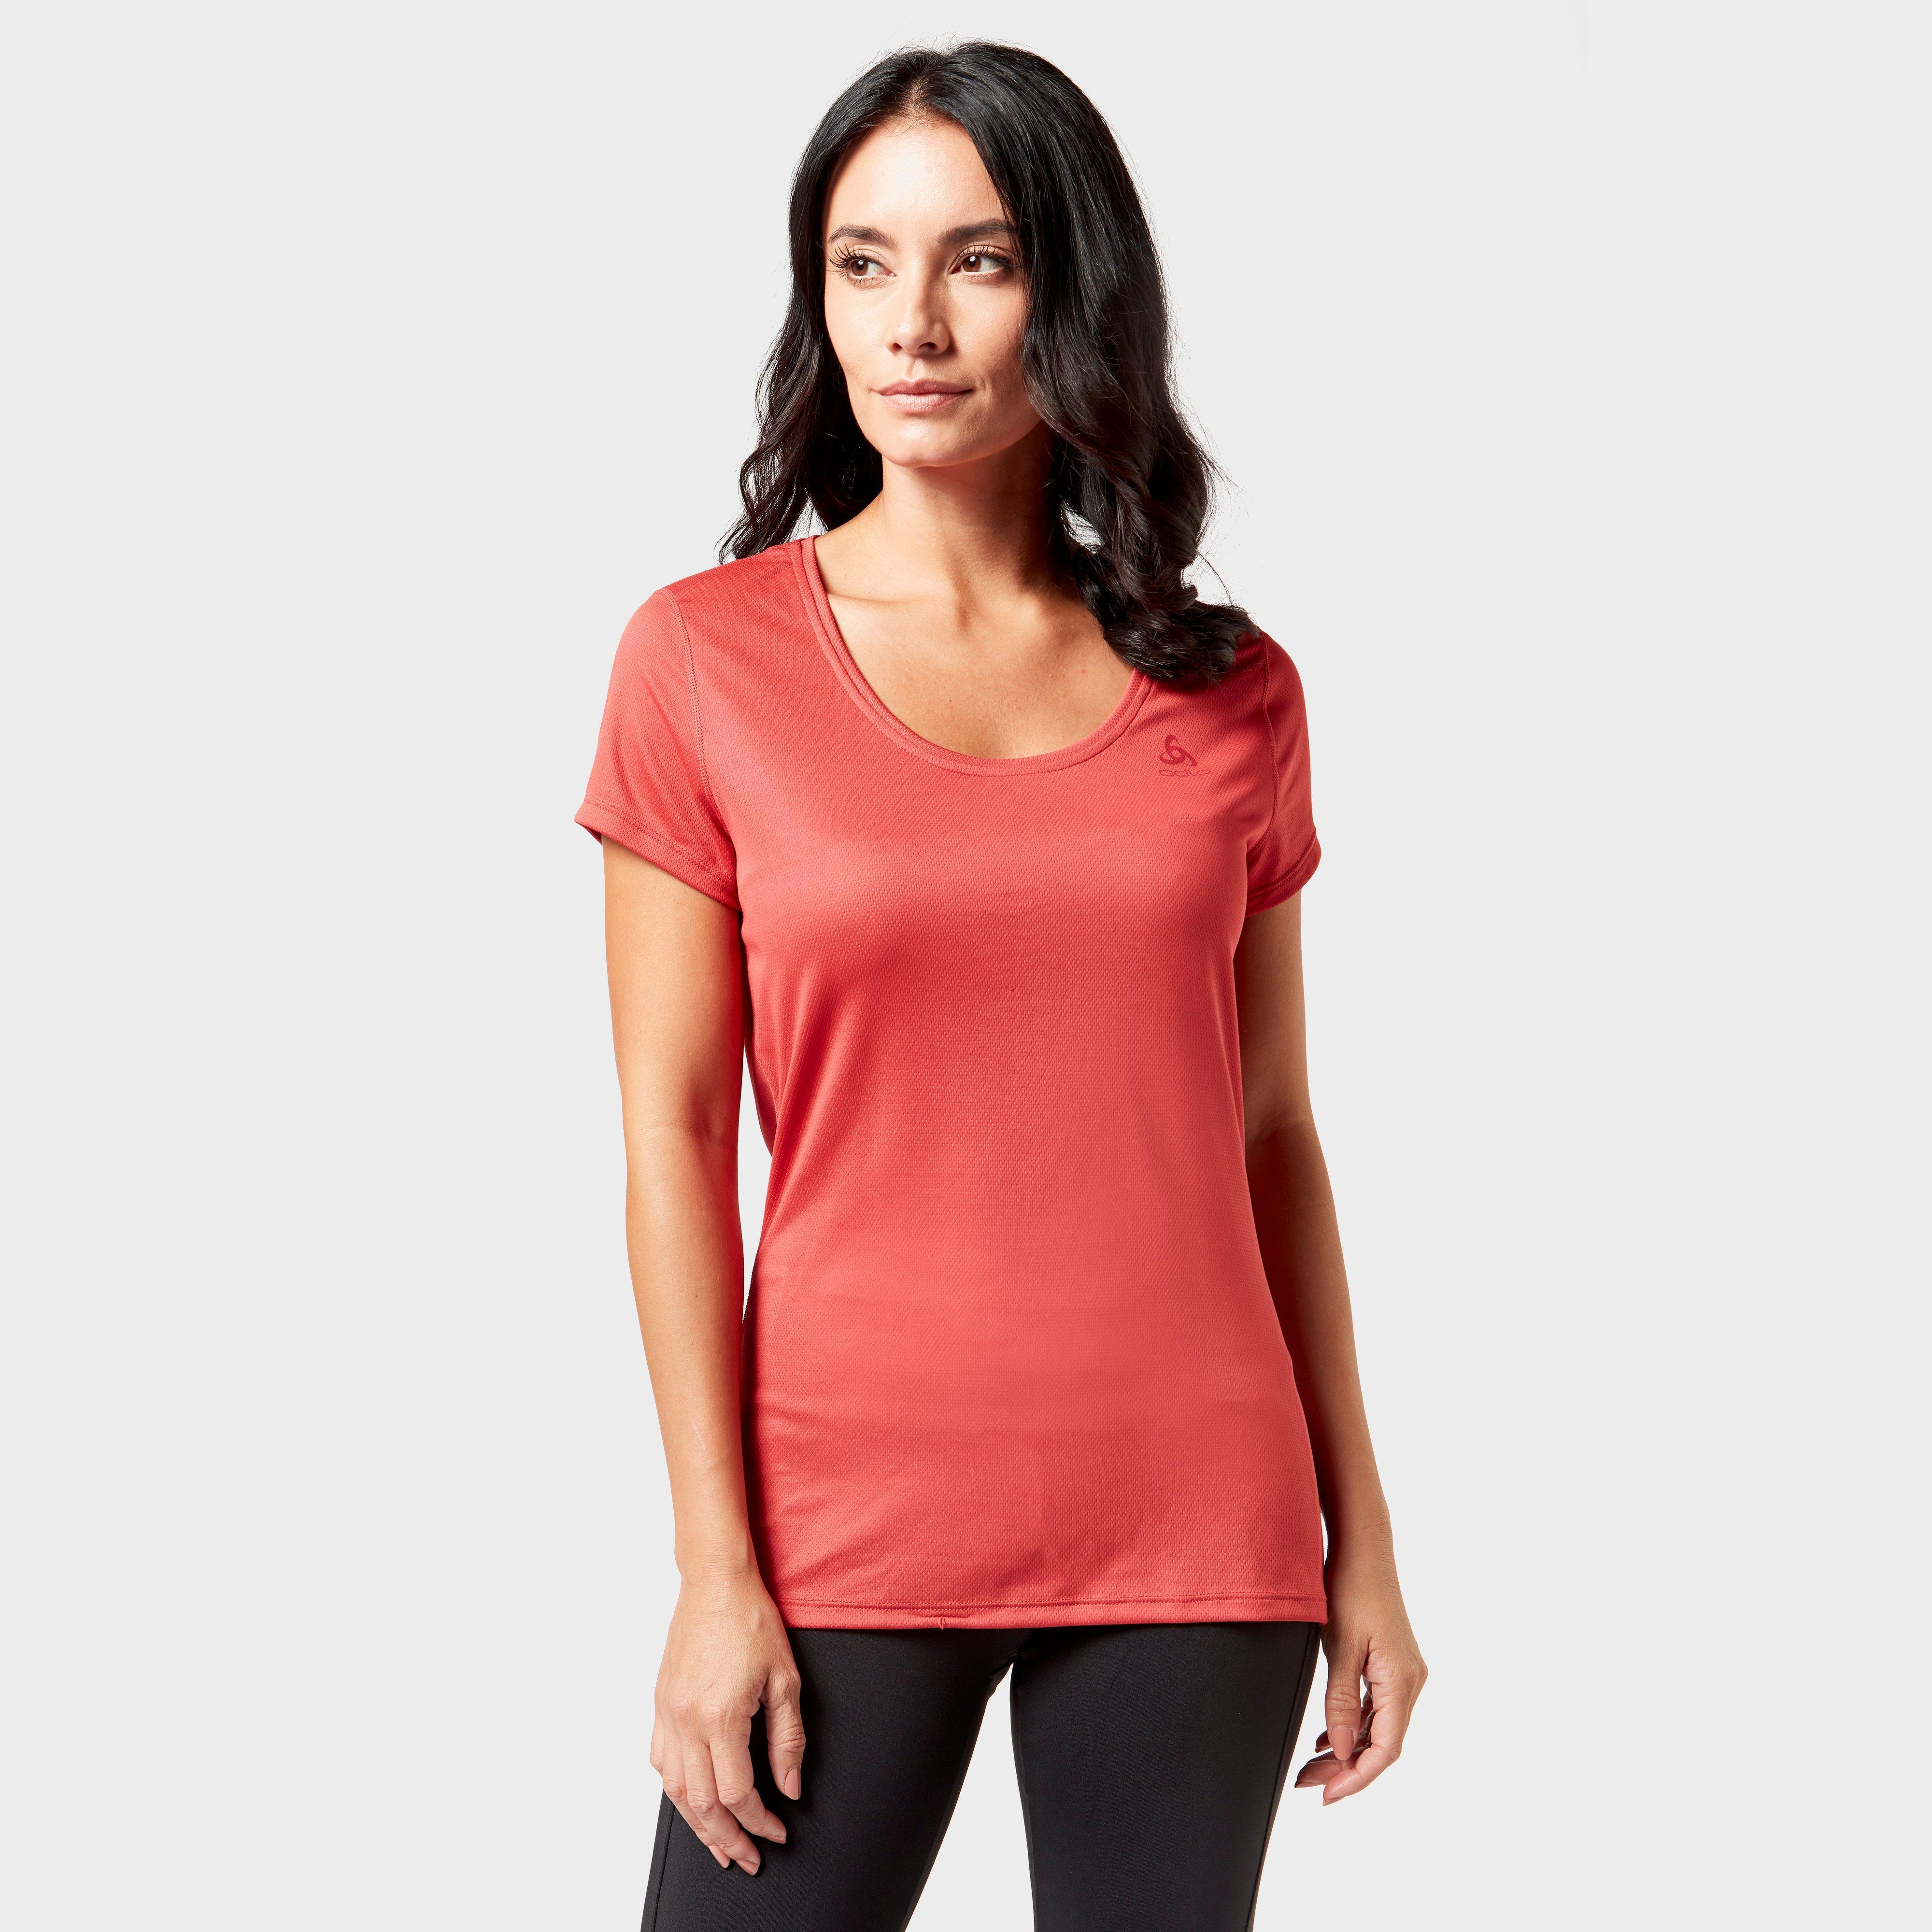 Odlo Odlo Womens Active F-Dry Light Baselayer T-Shirt - Pink, Pink